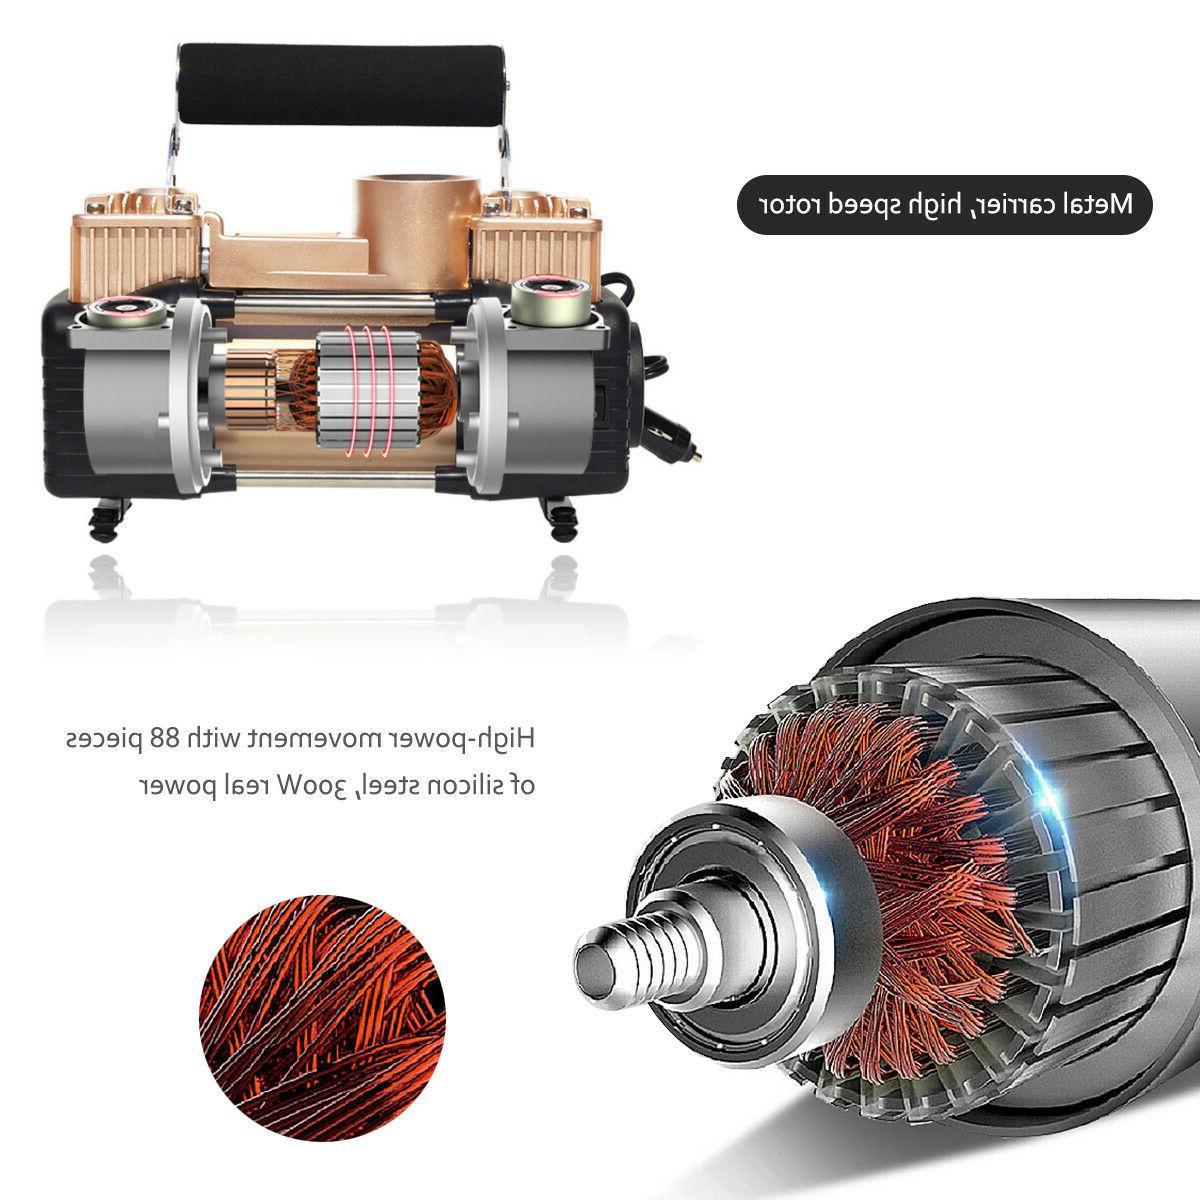 HEAVY Portable Air Compressor Inflator Auto